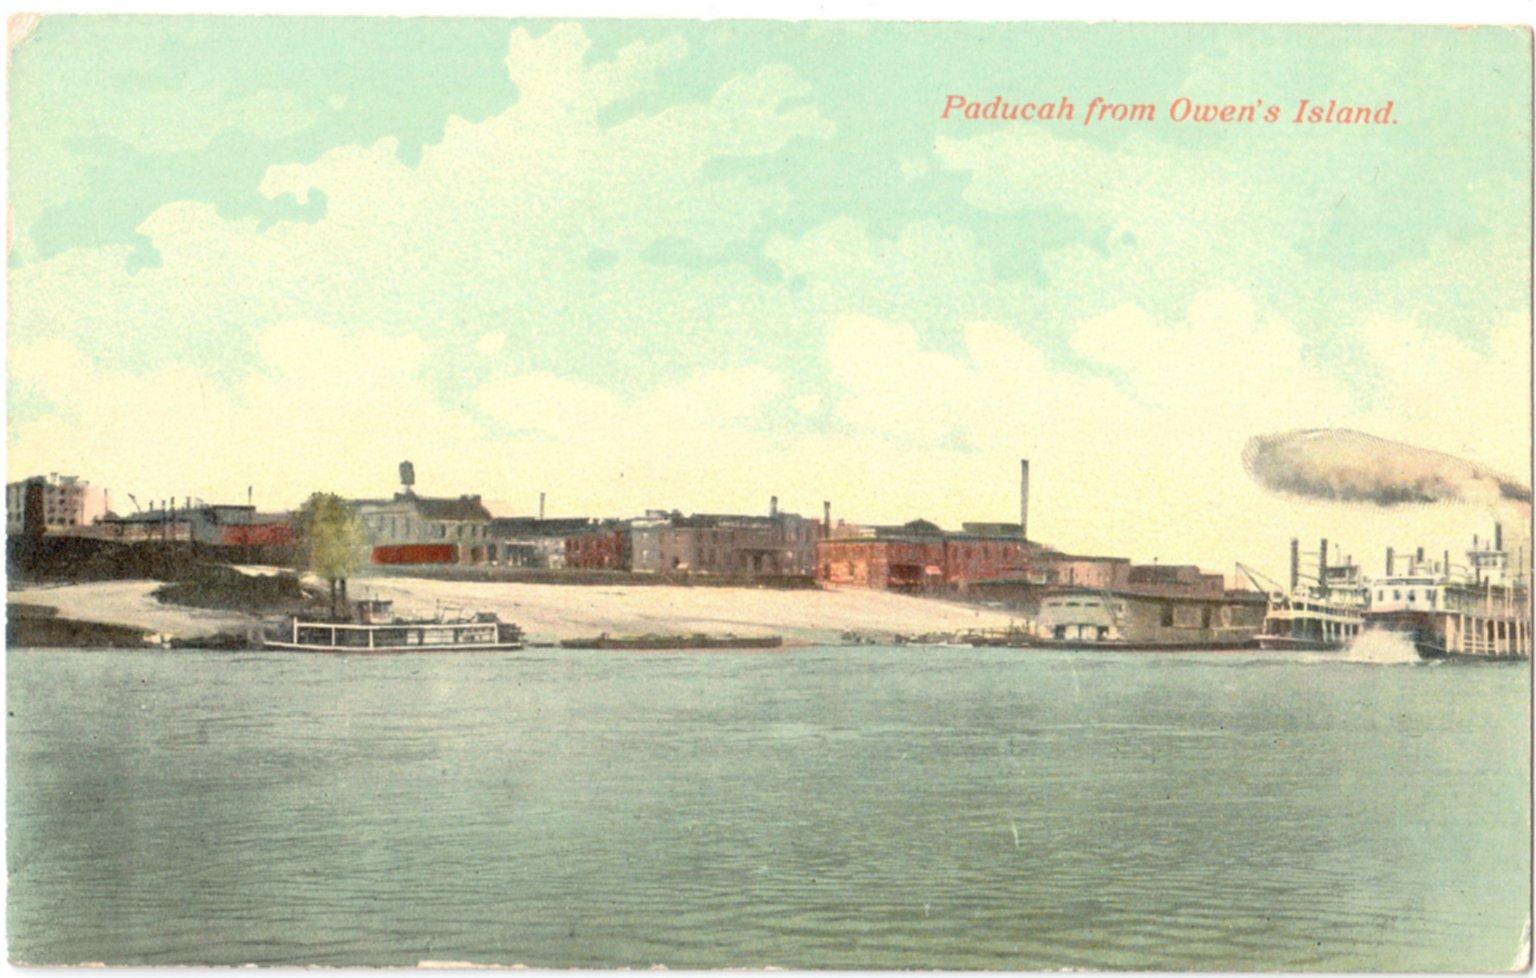 Paducah from Owen's Island.